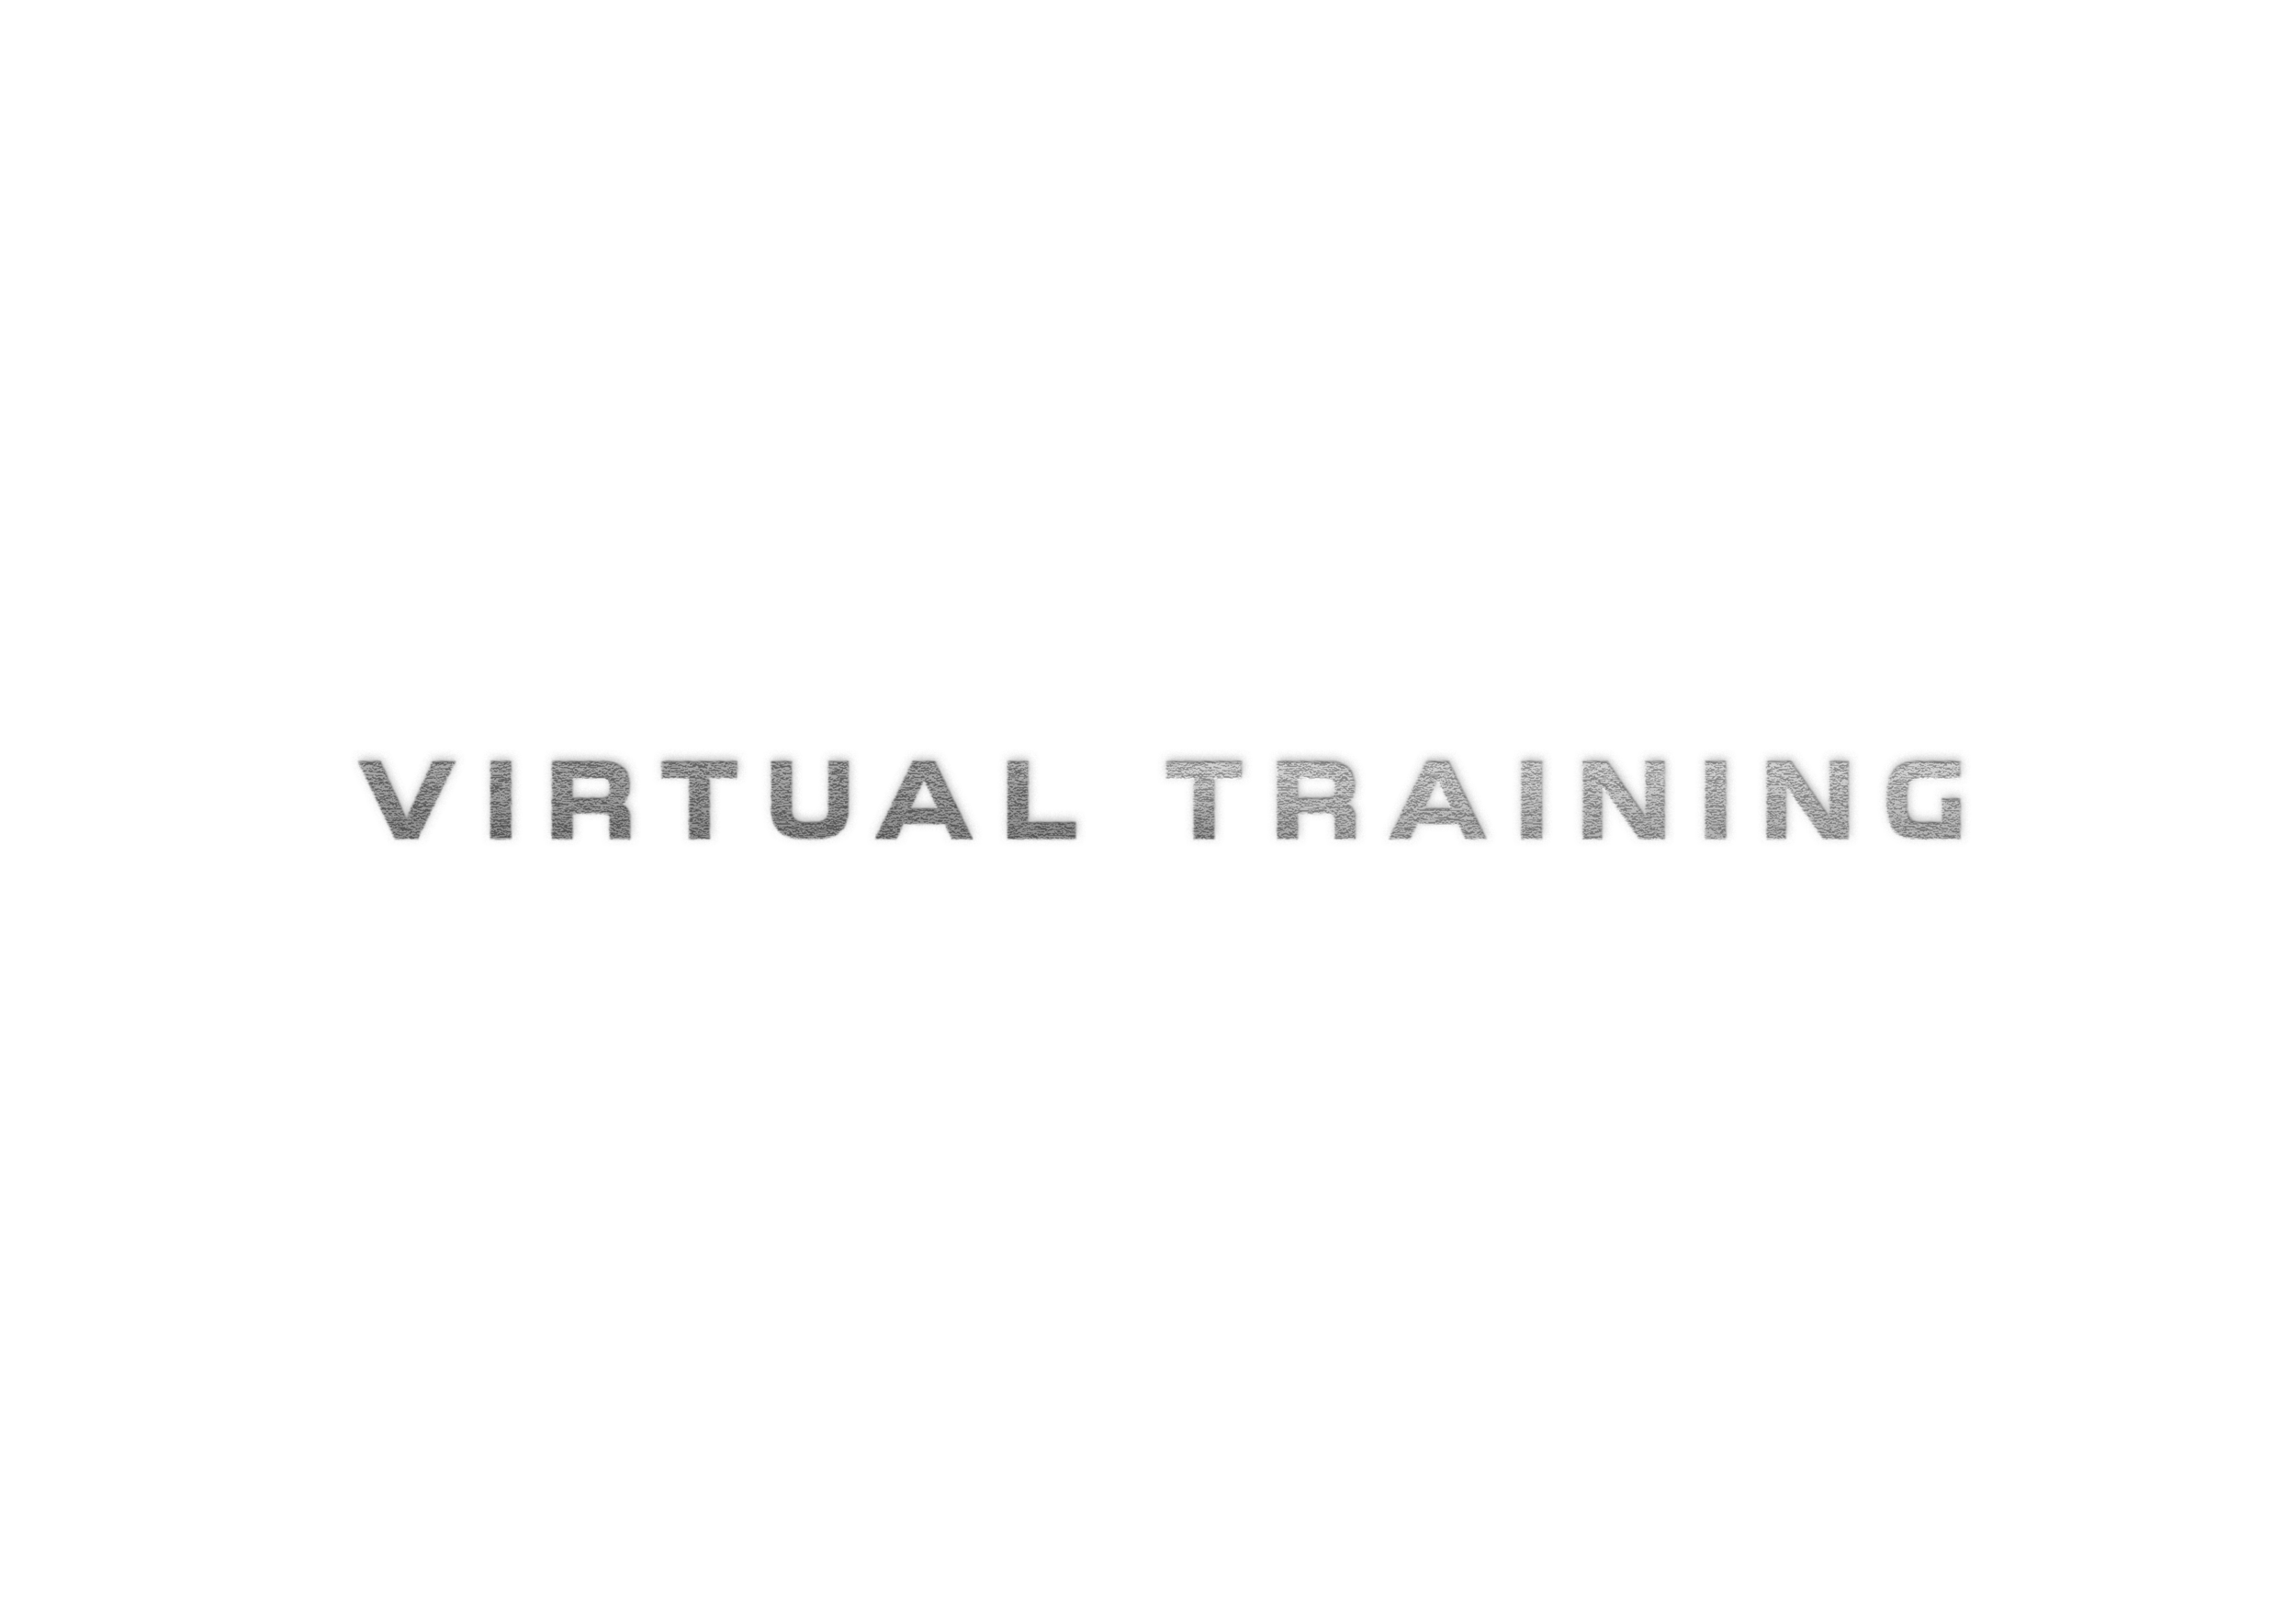 VIRTUAL-TRAINING.png